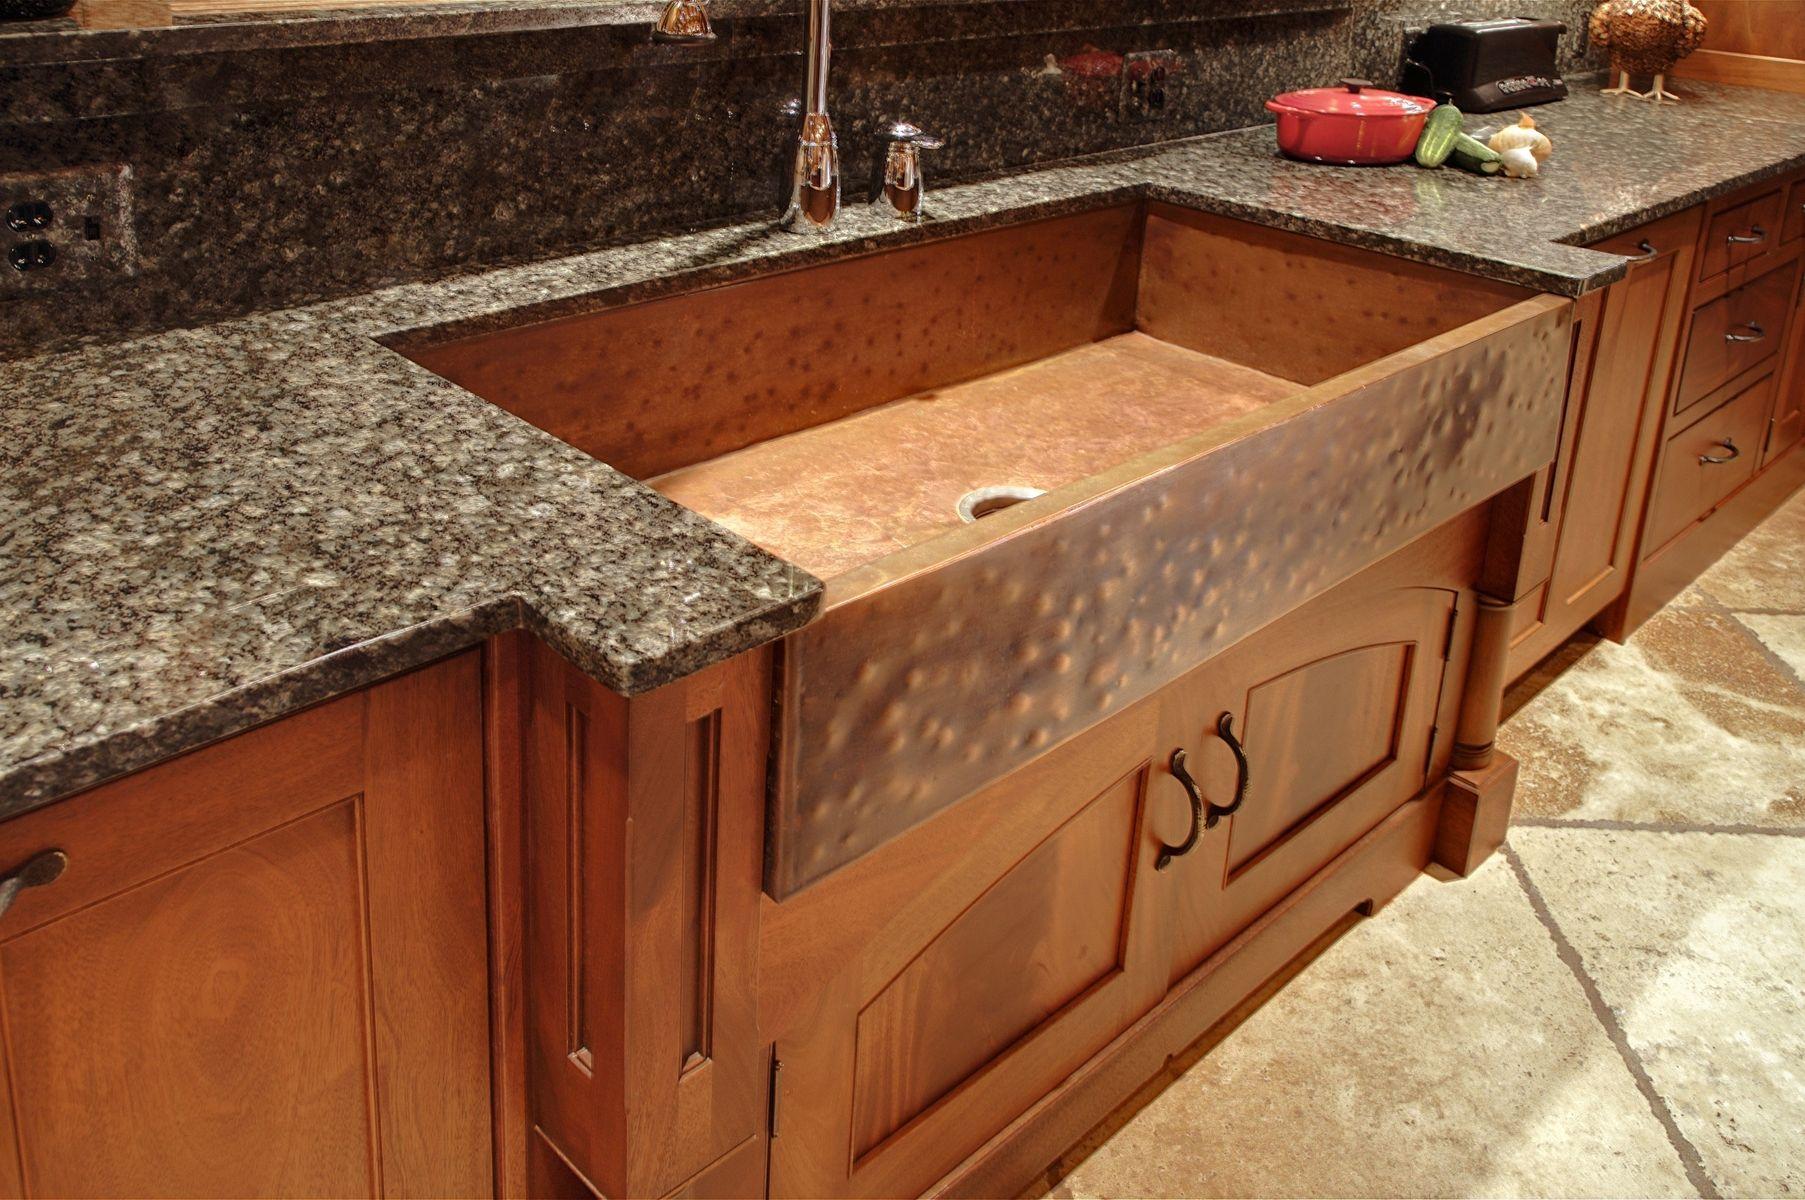 Mcnabb Farm Style Copper Sink CustomMade By Darin Fetter Copper Farm Style  Sink. Features: